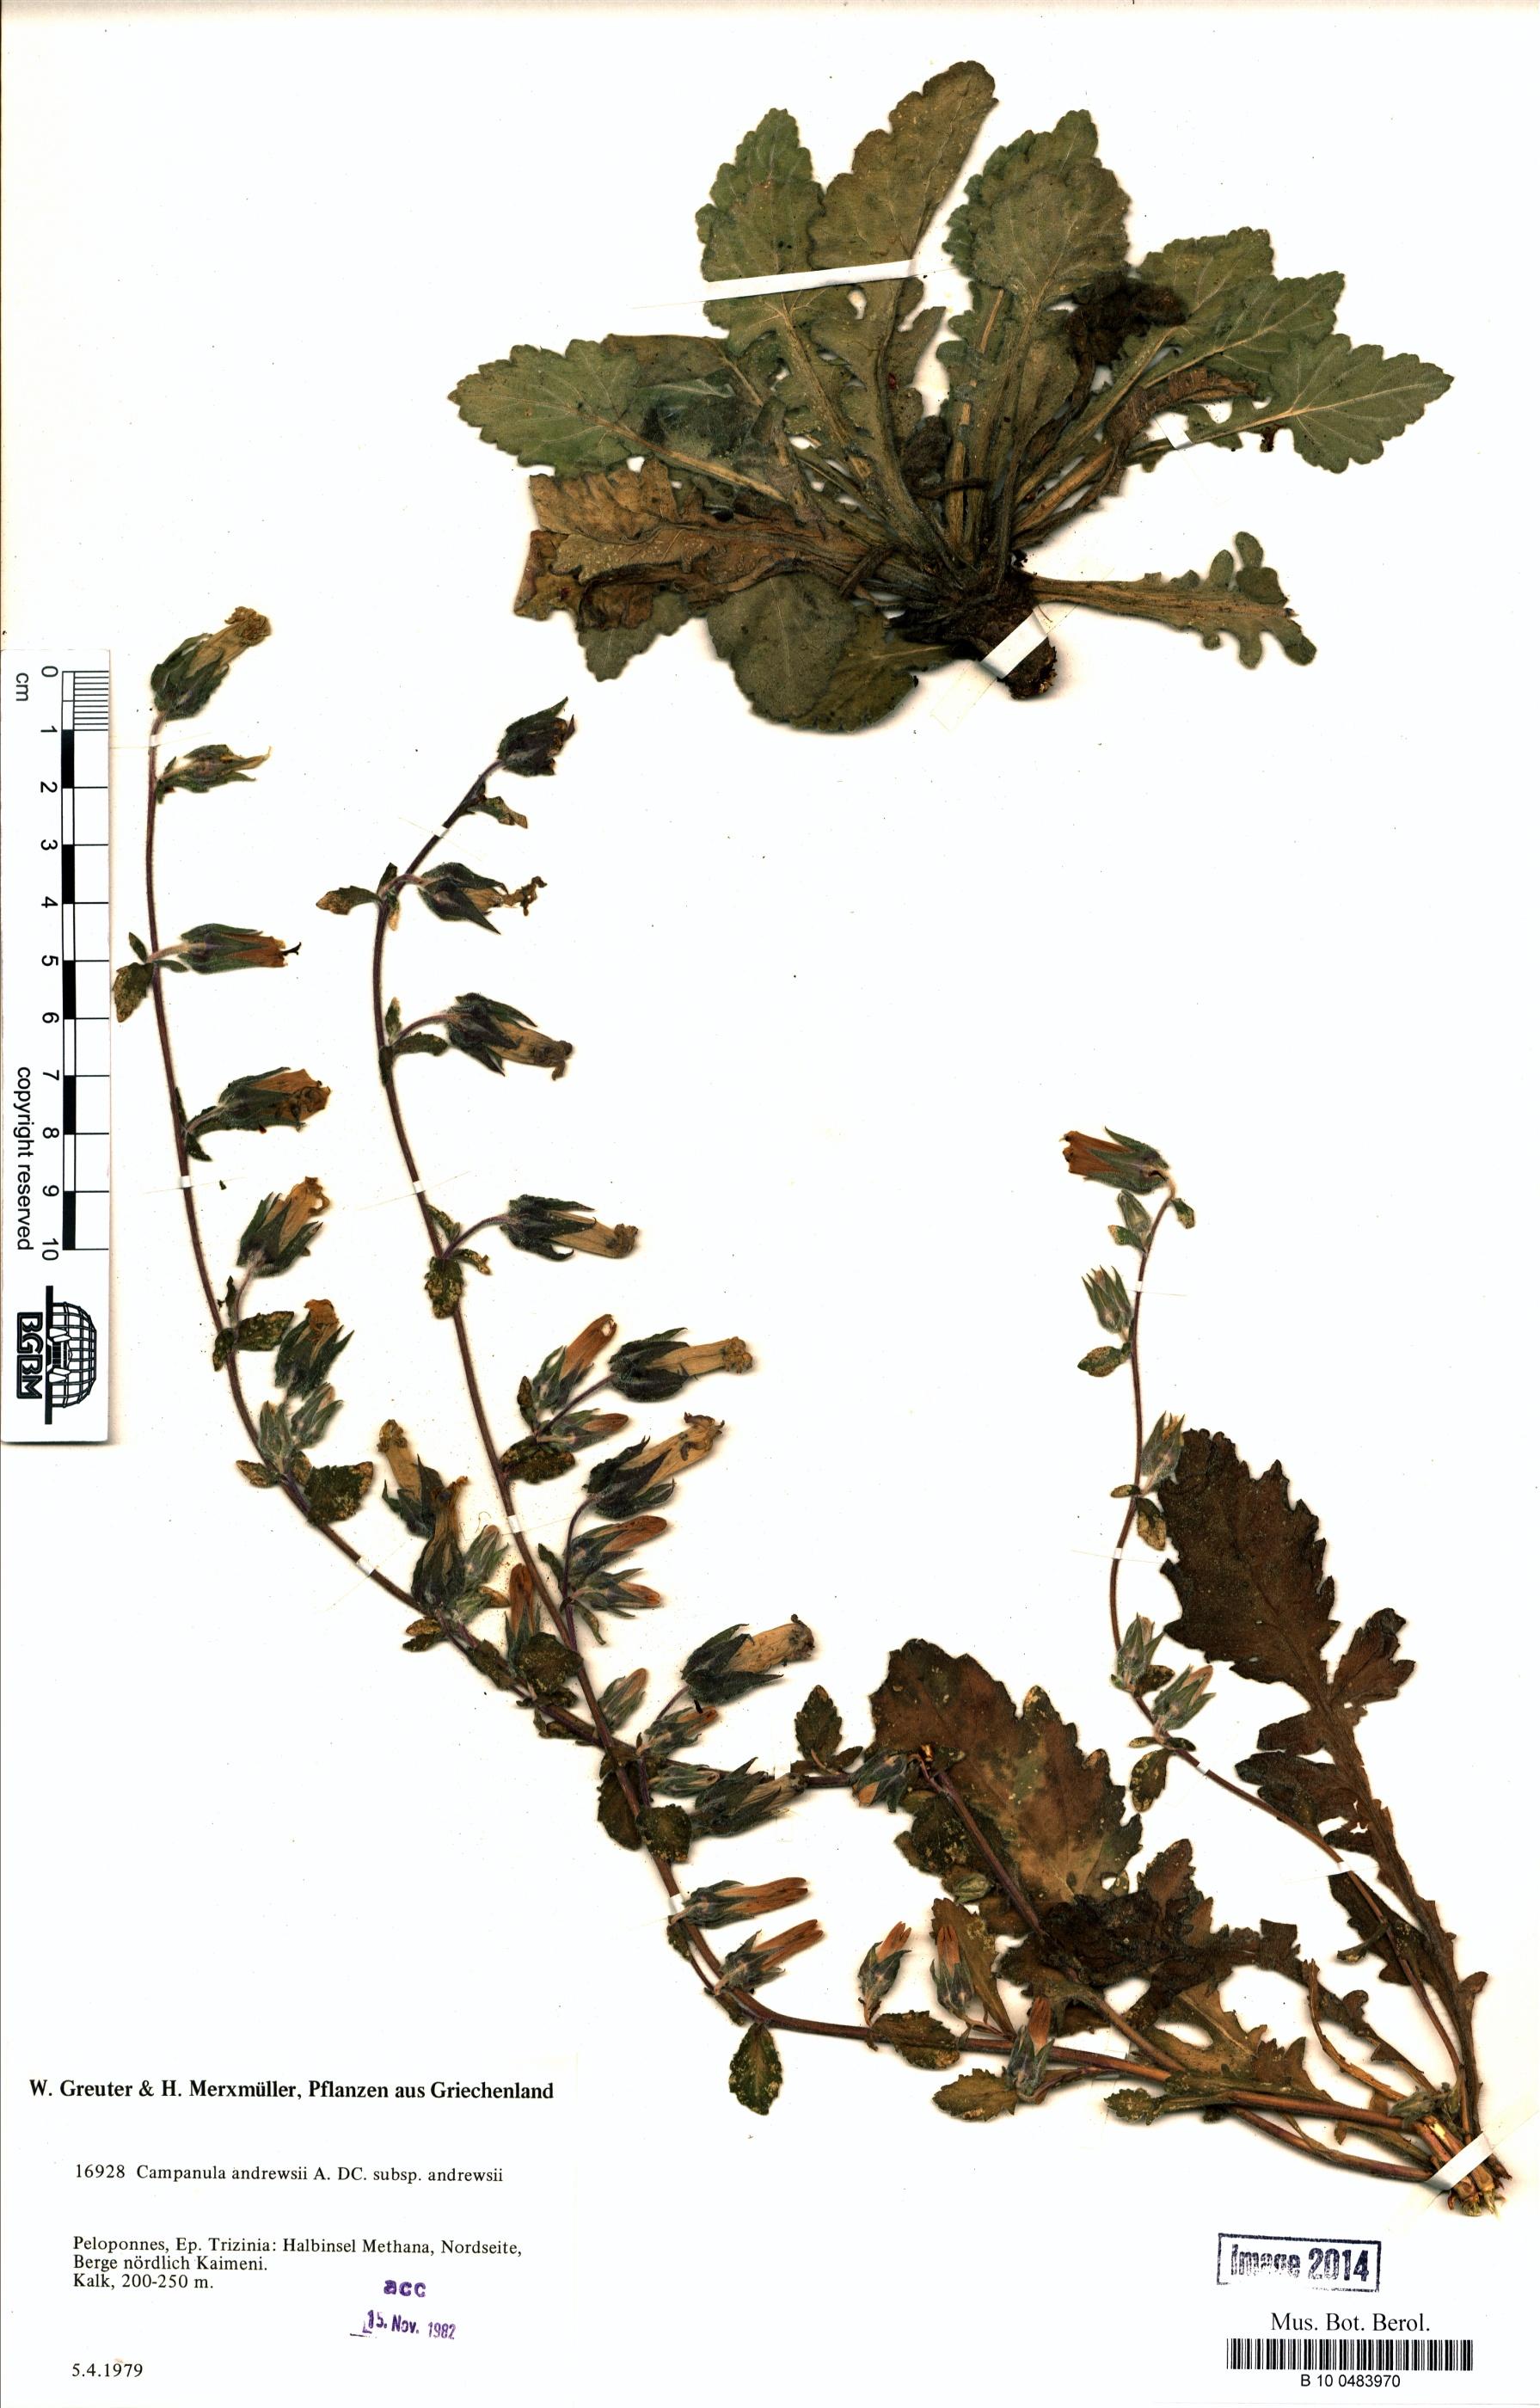 http://ww2.bgbm.org/herbarium/images/B/10/04/83/97/B_10_0483970.jpg